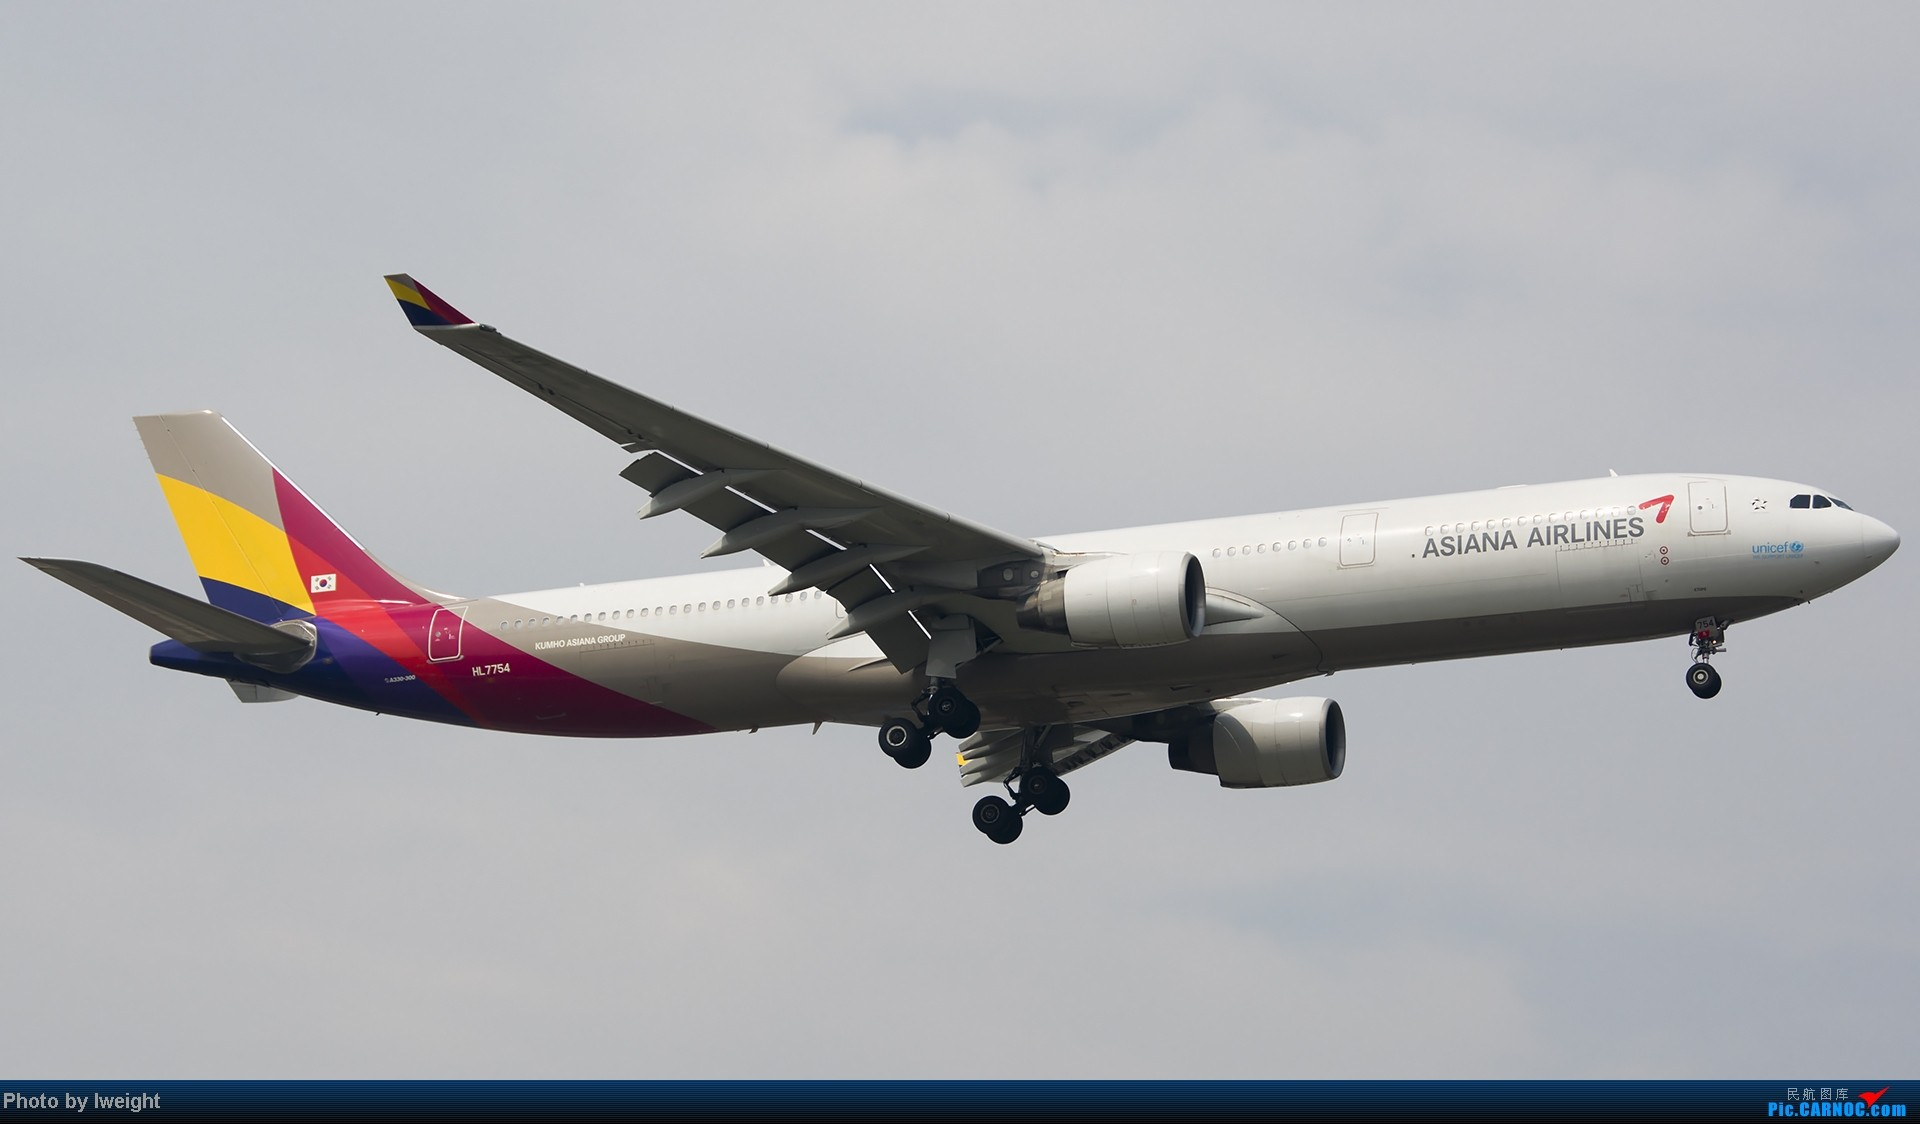 Re:[原创]休假无聊,跑道边来拍机玩(晚点的ZestAir、换装的B6100和刚交付的B2738等) AIRBUS A330-300 HL7754 中国北京首都机场